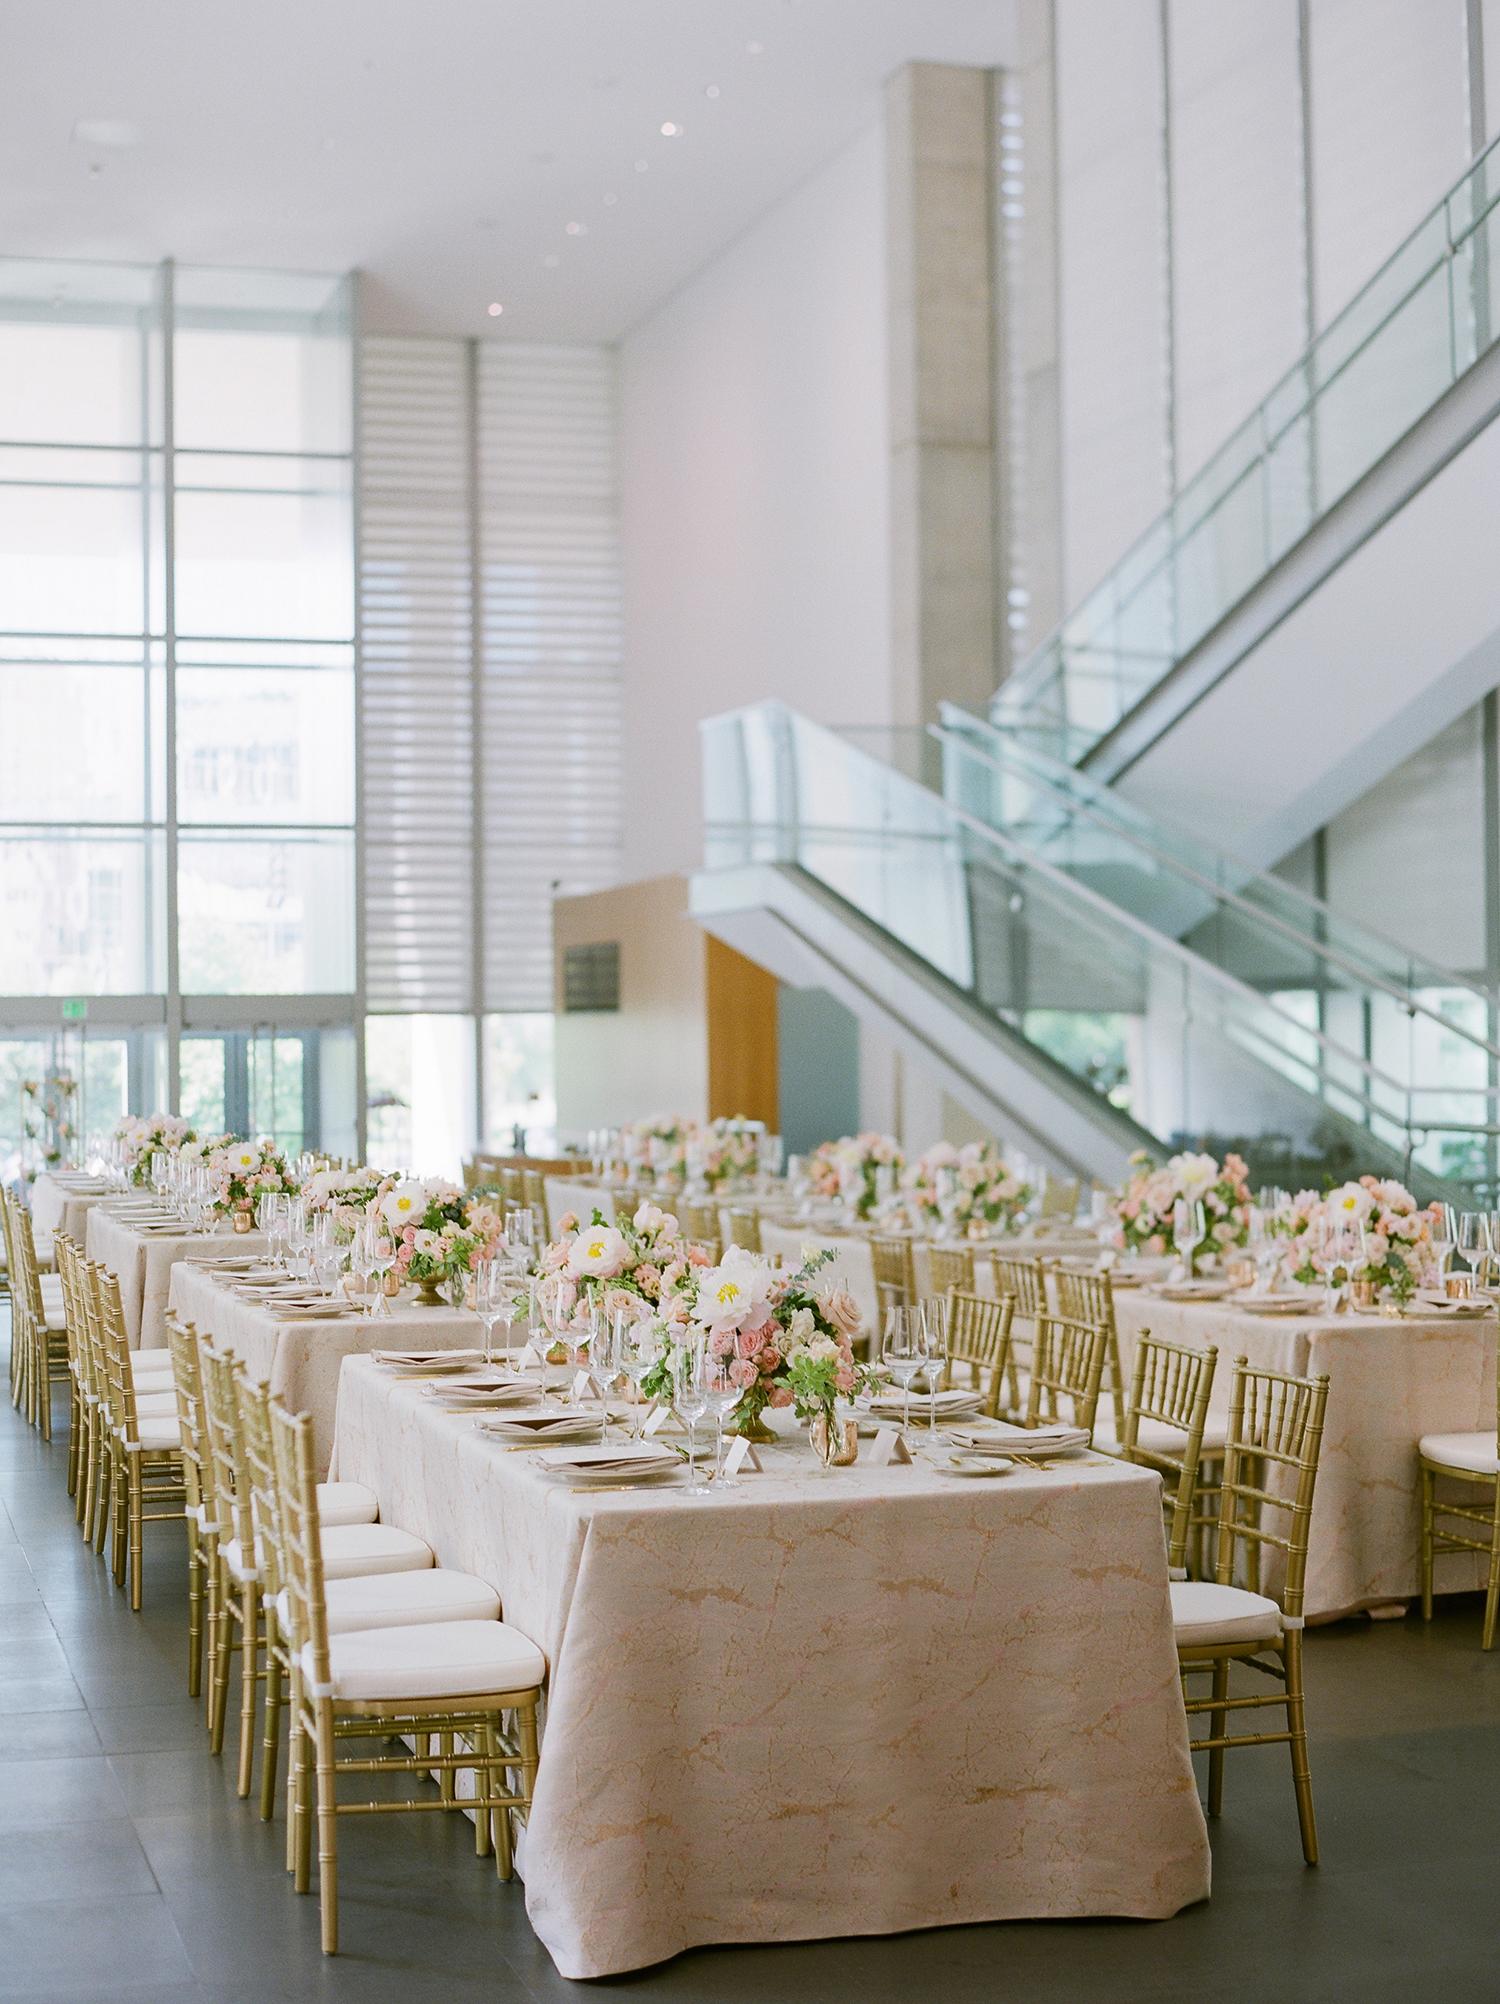 anwuli patrick wedding reception tables